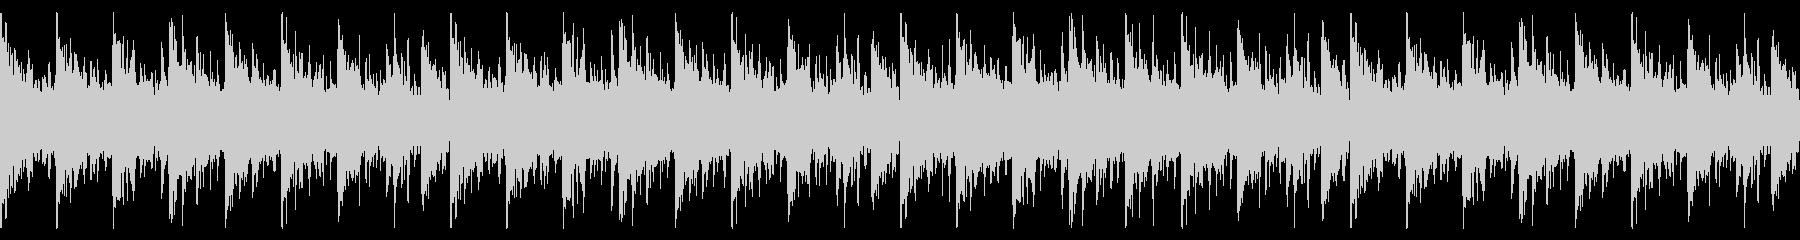 indian_piano_loop_02の未再生の波形